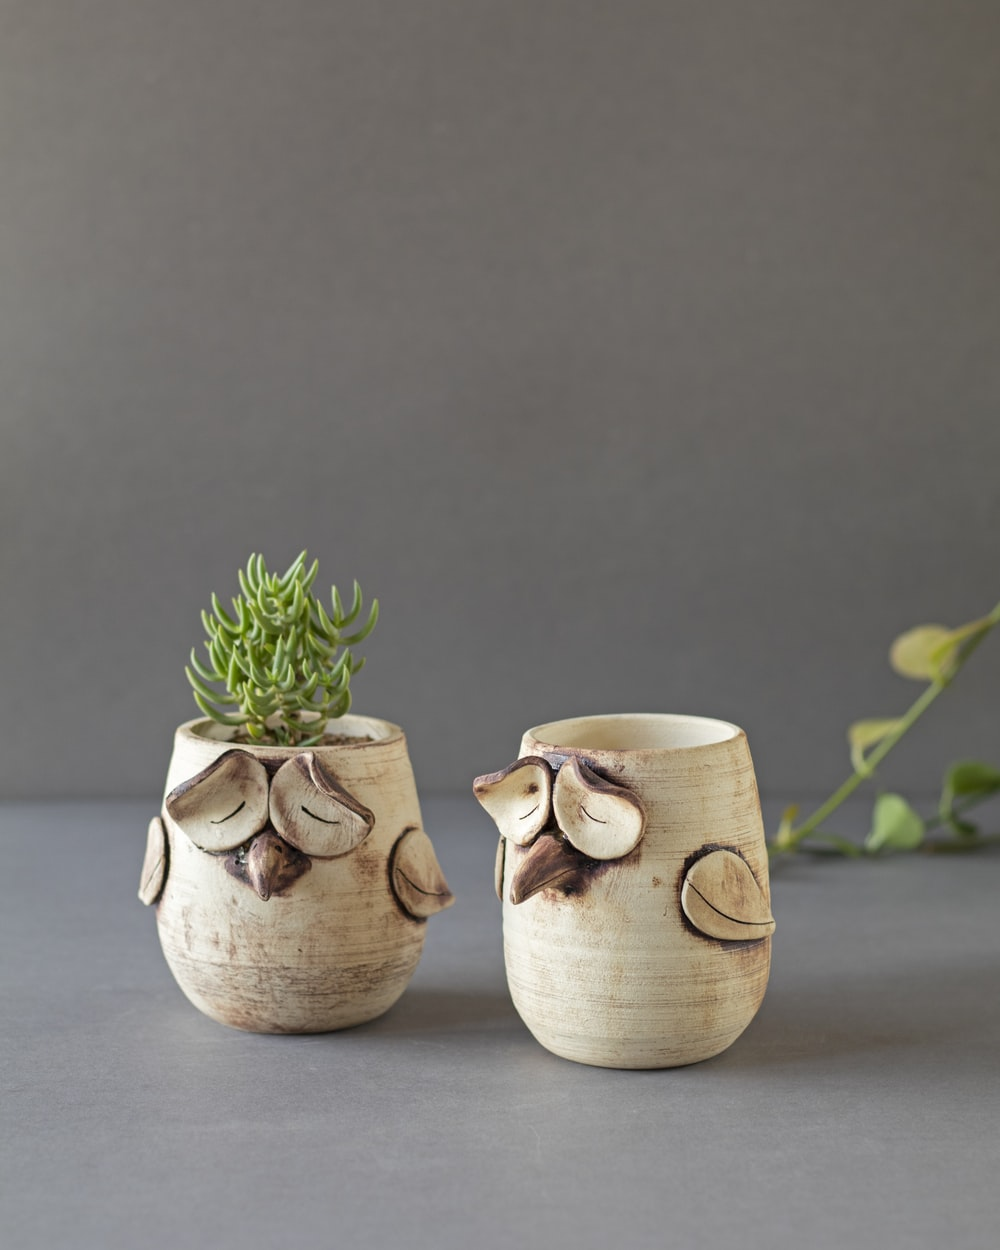 2 white ceramic mugs on gray table